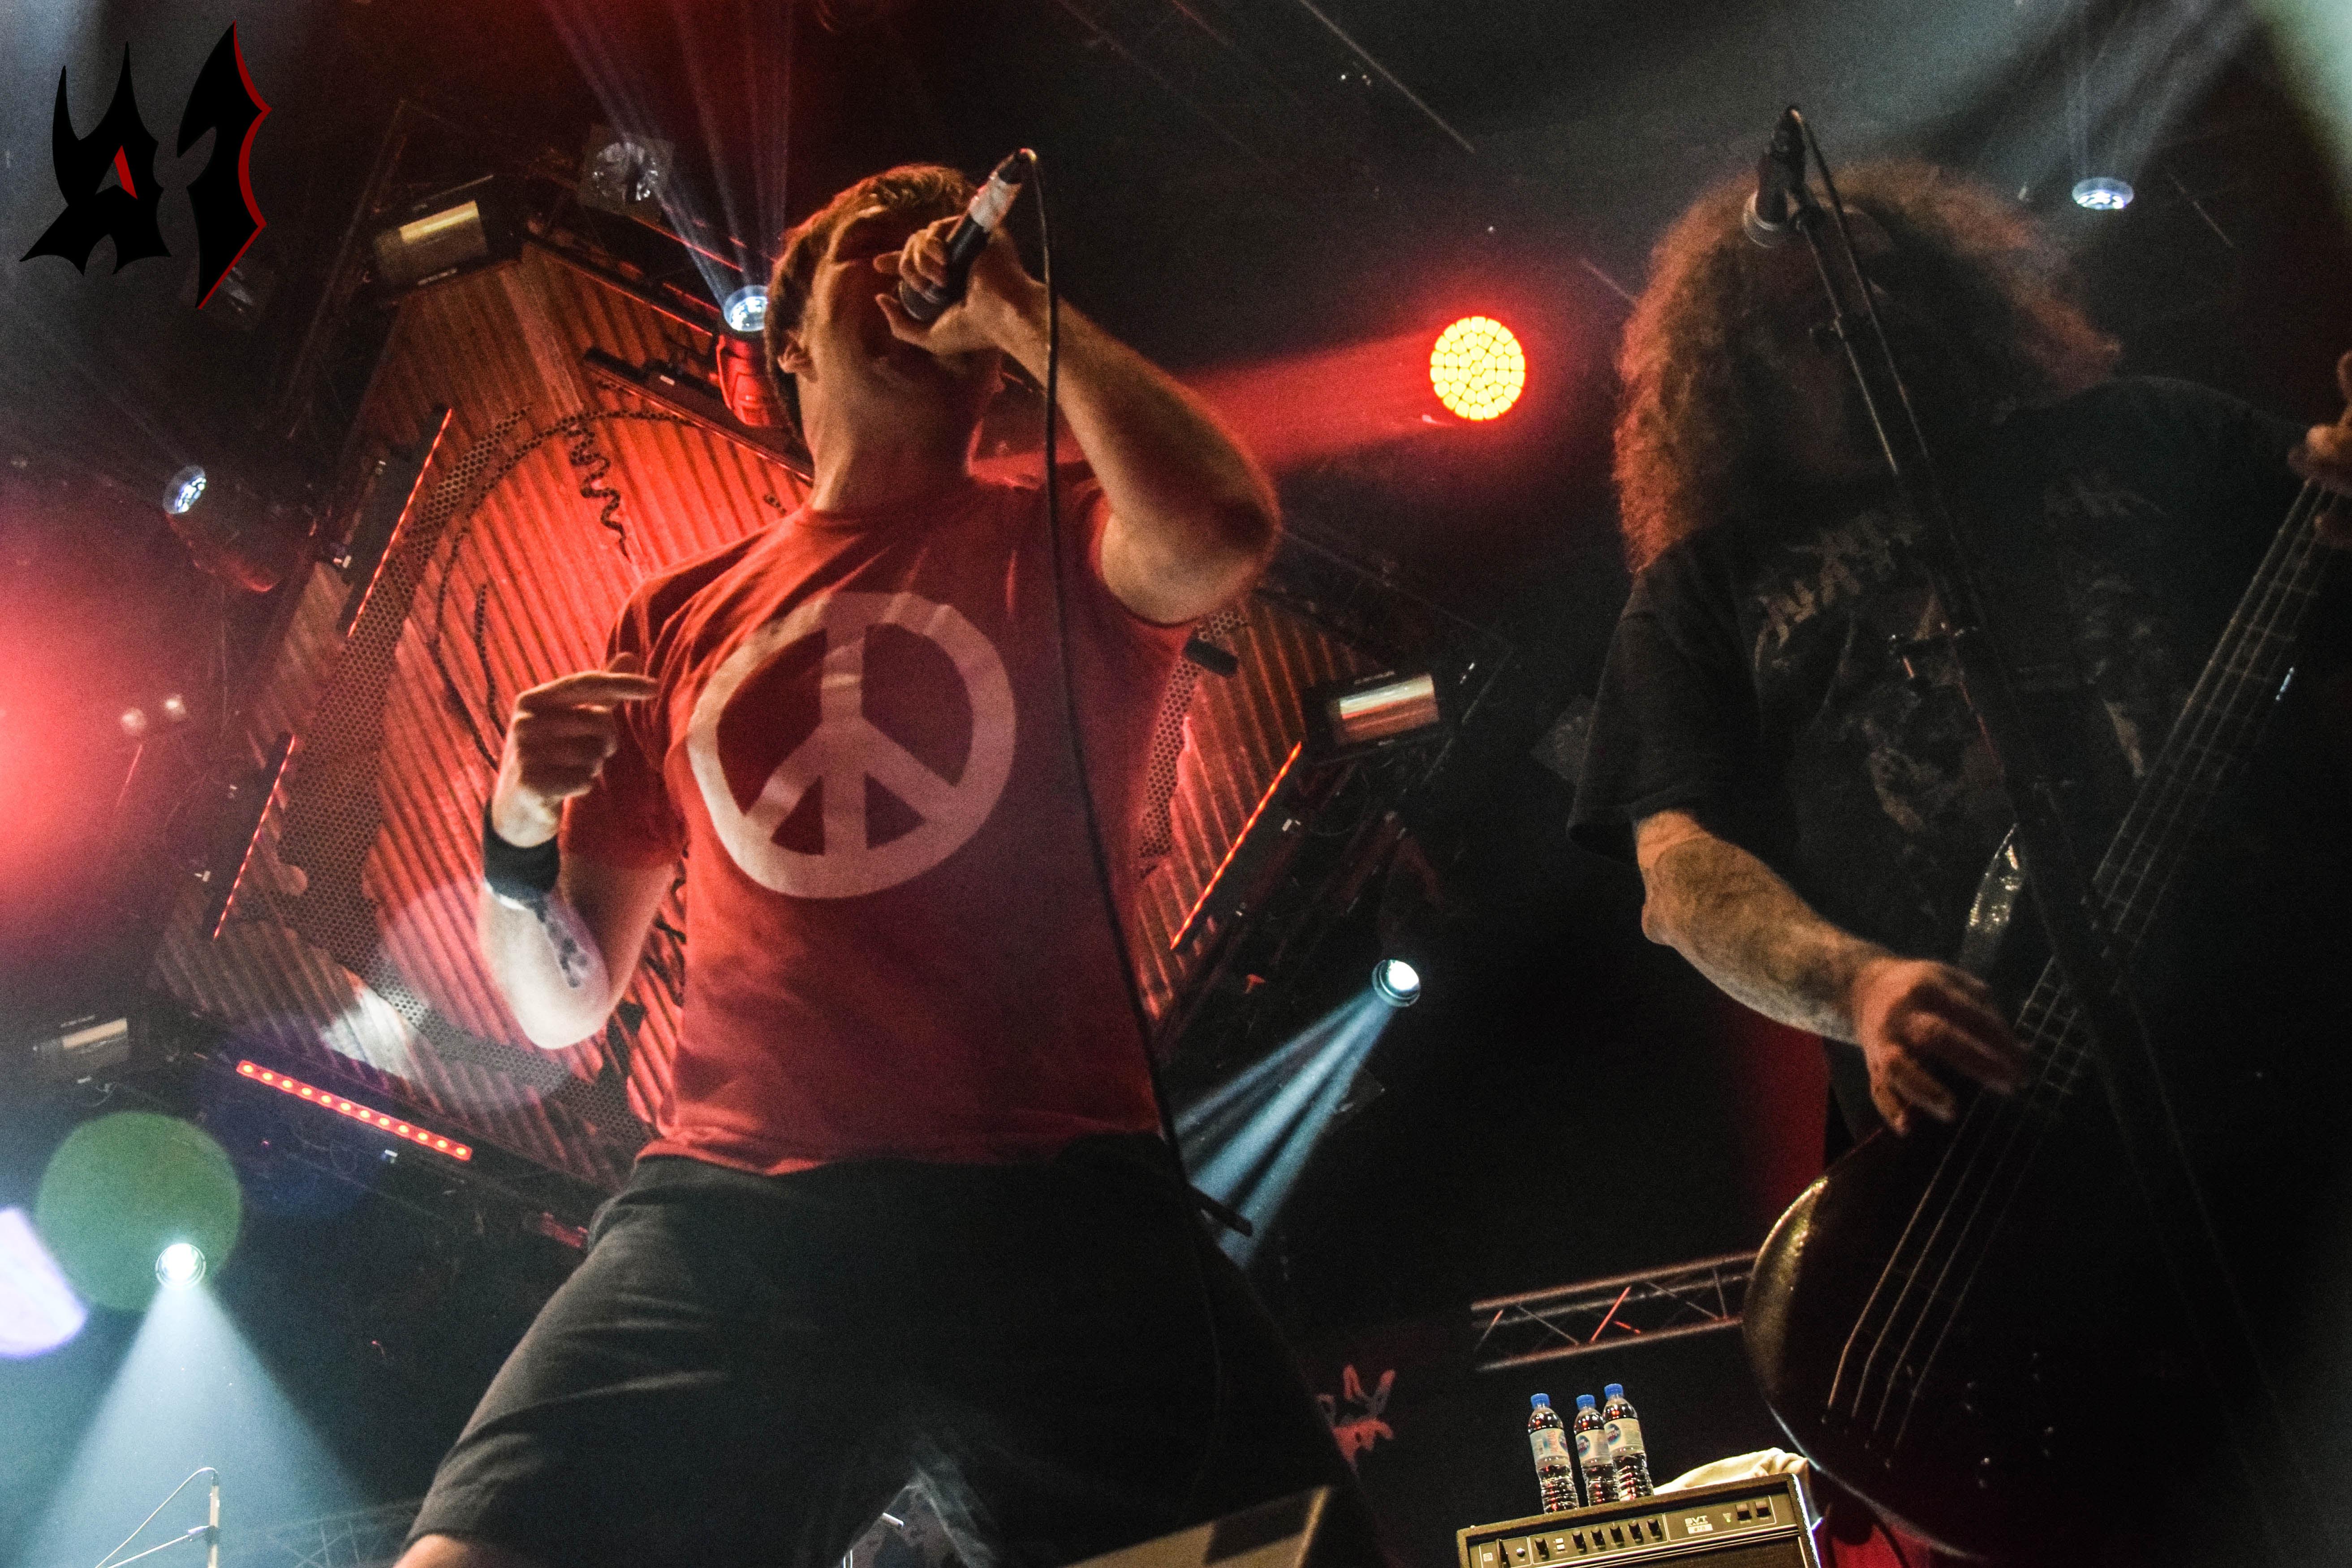 Hellfest - Day 1 - Napalm Death 12